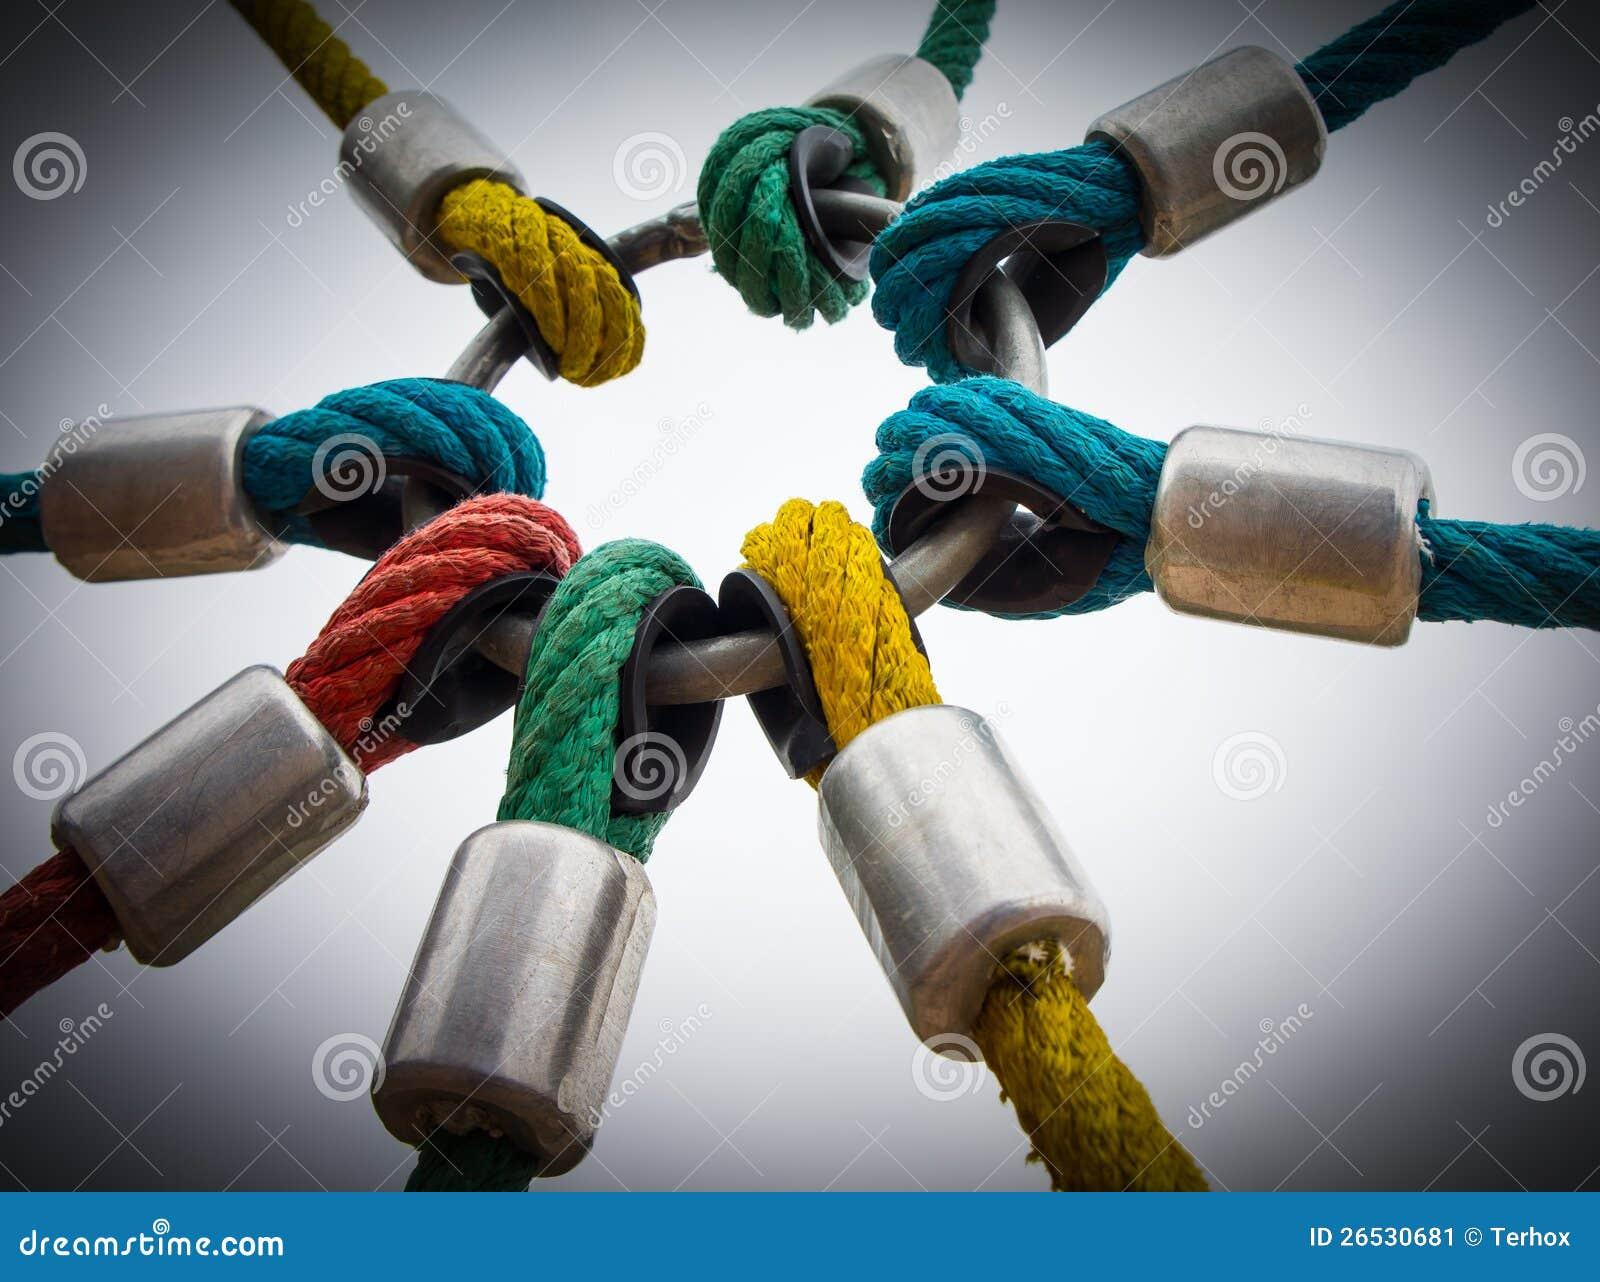 Powerful links